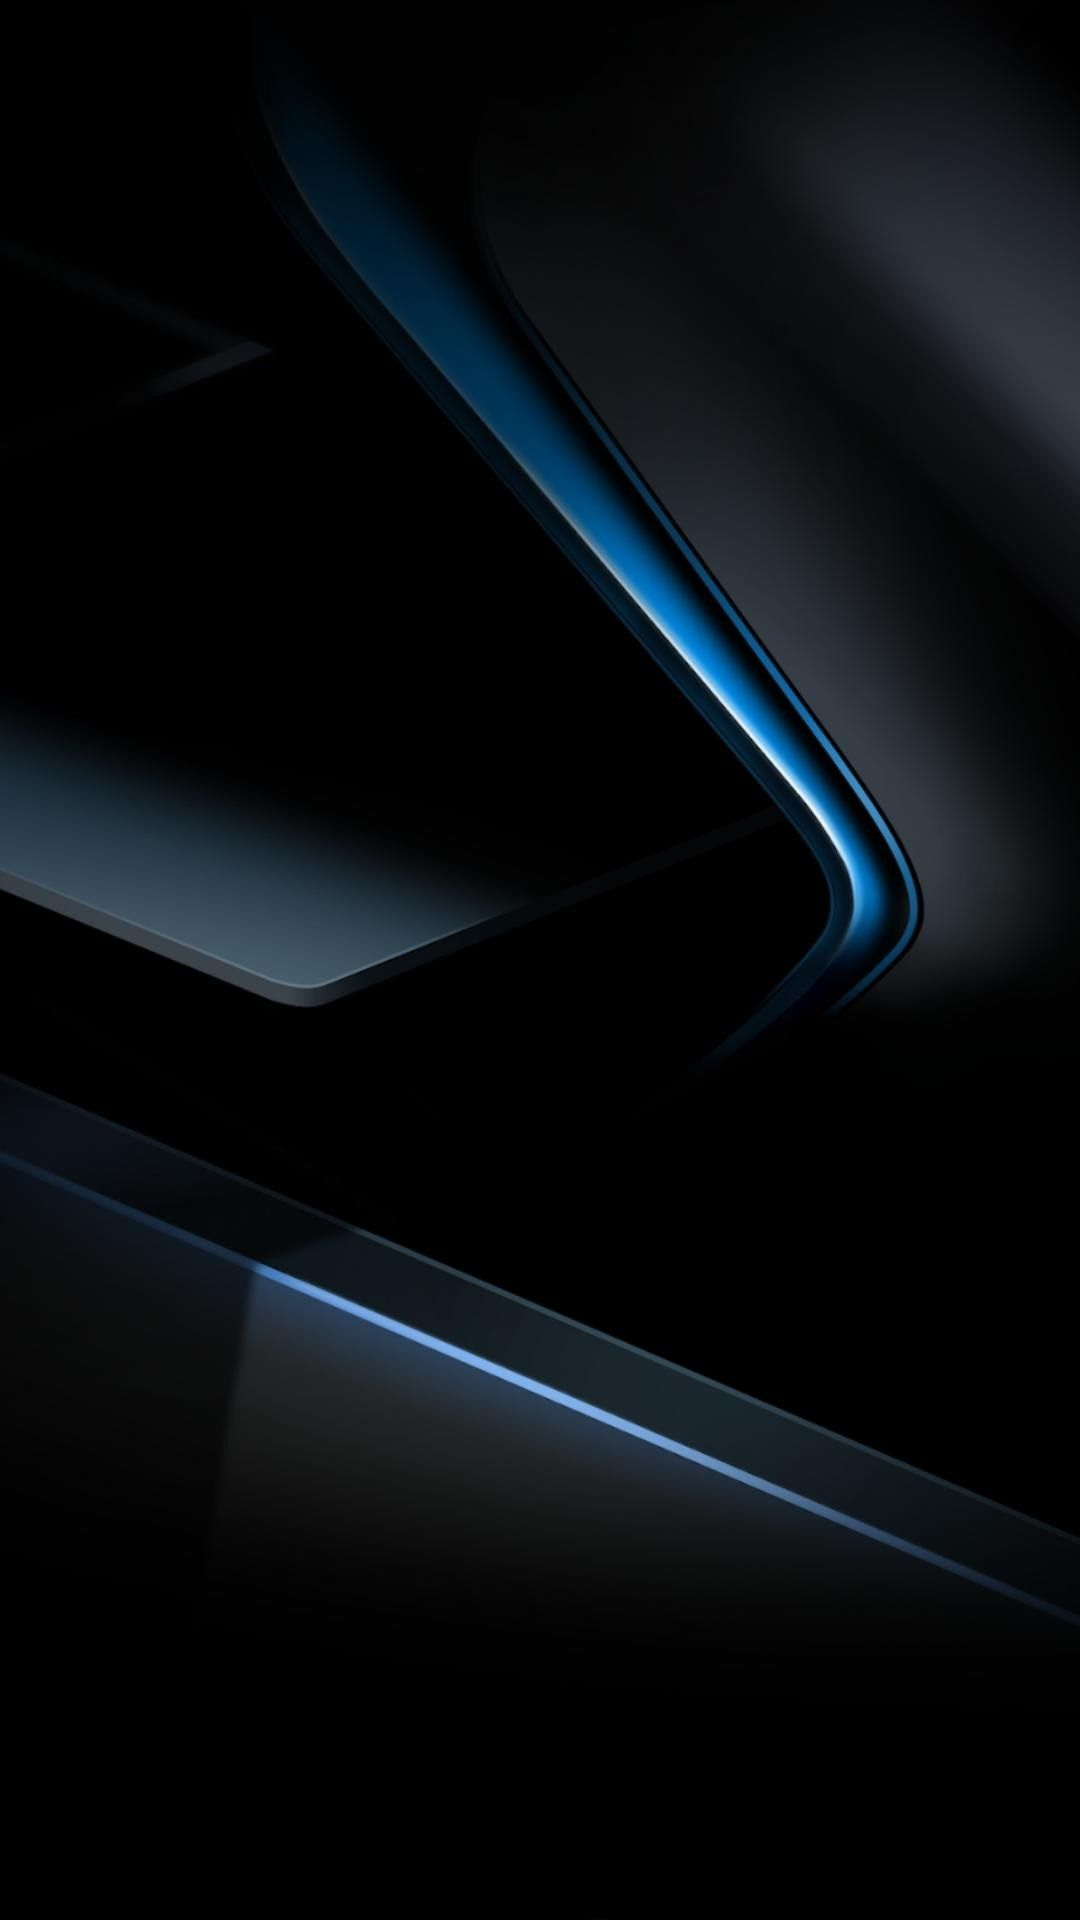 Blue Metalic Phone Wallpaper Design Black And Blue Wallpaper Black Phone Wallpaper